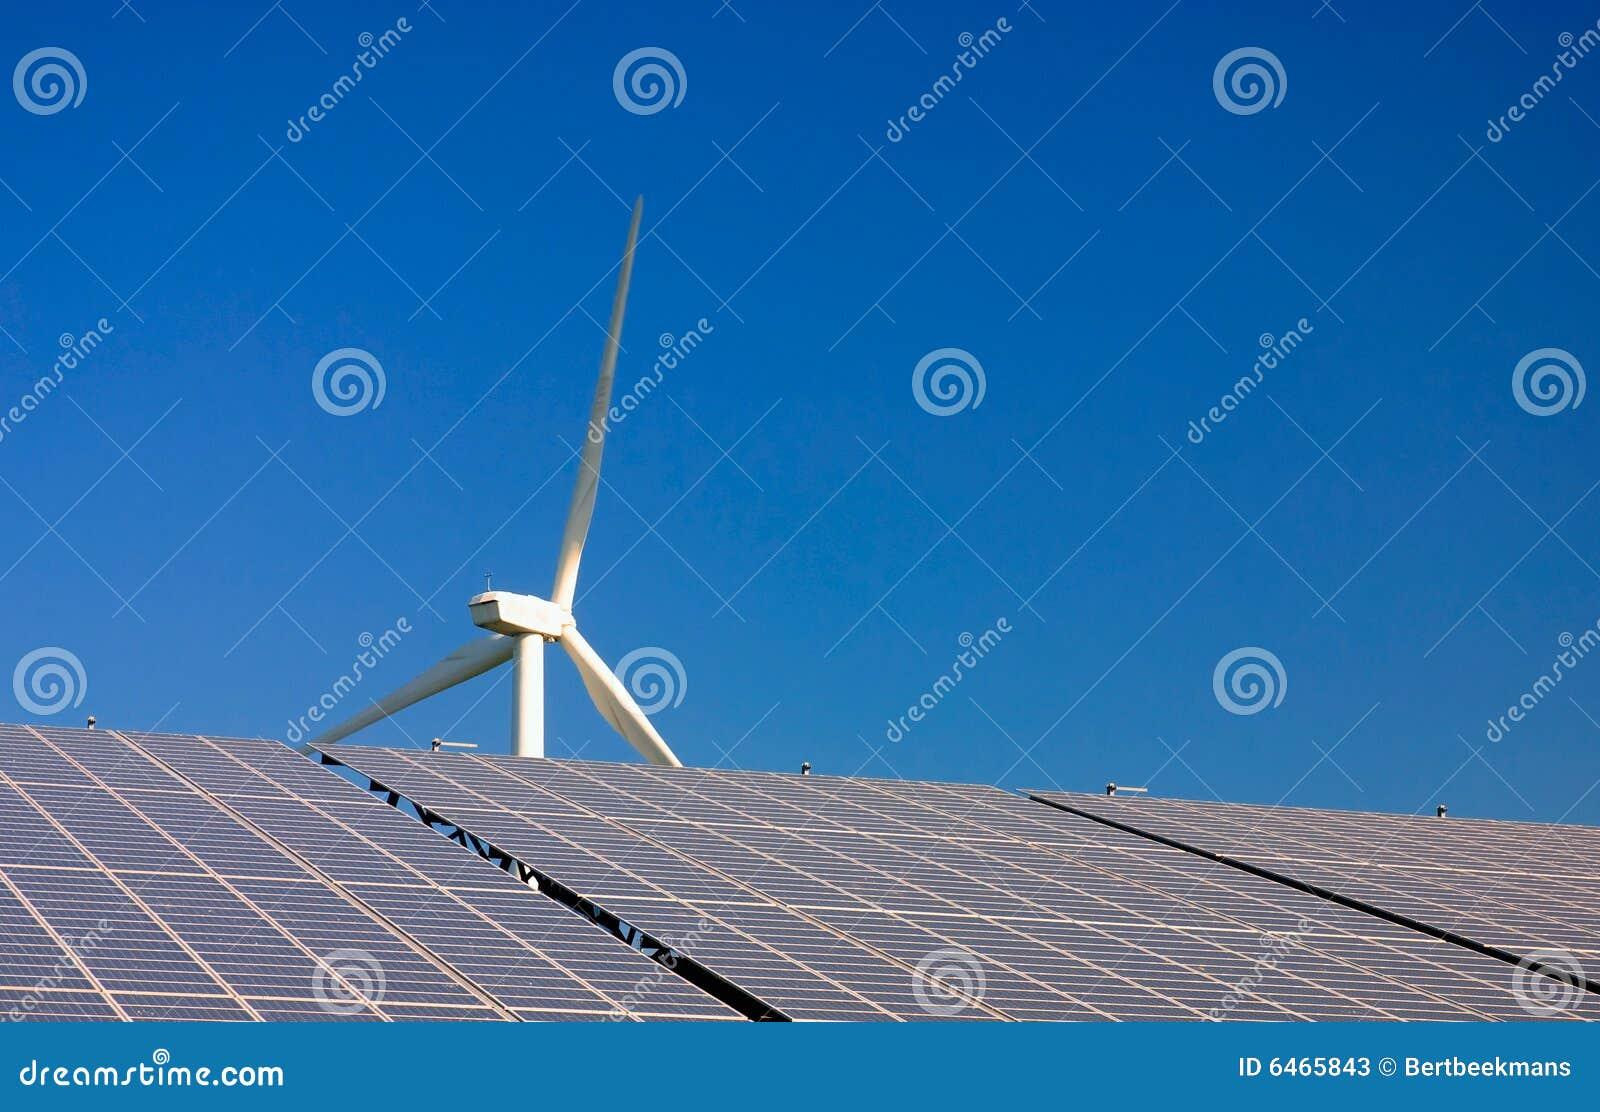 Wind turbines - solar cells power plant